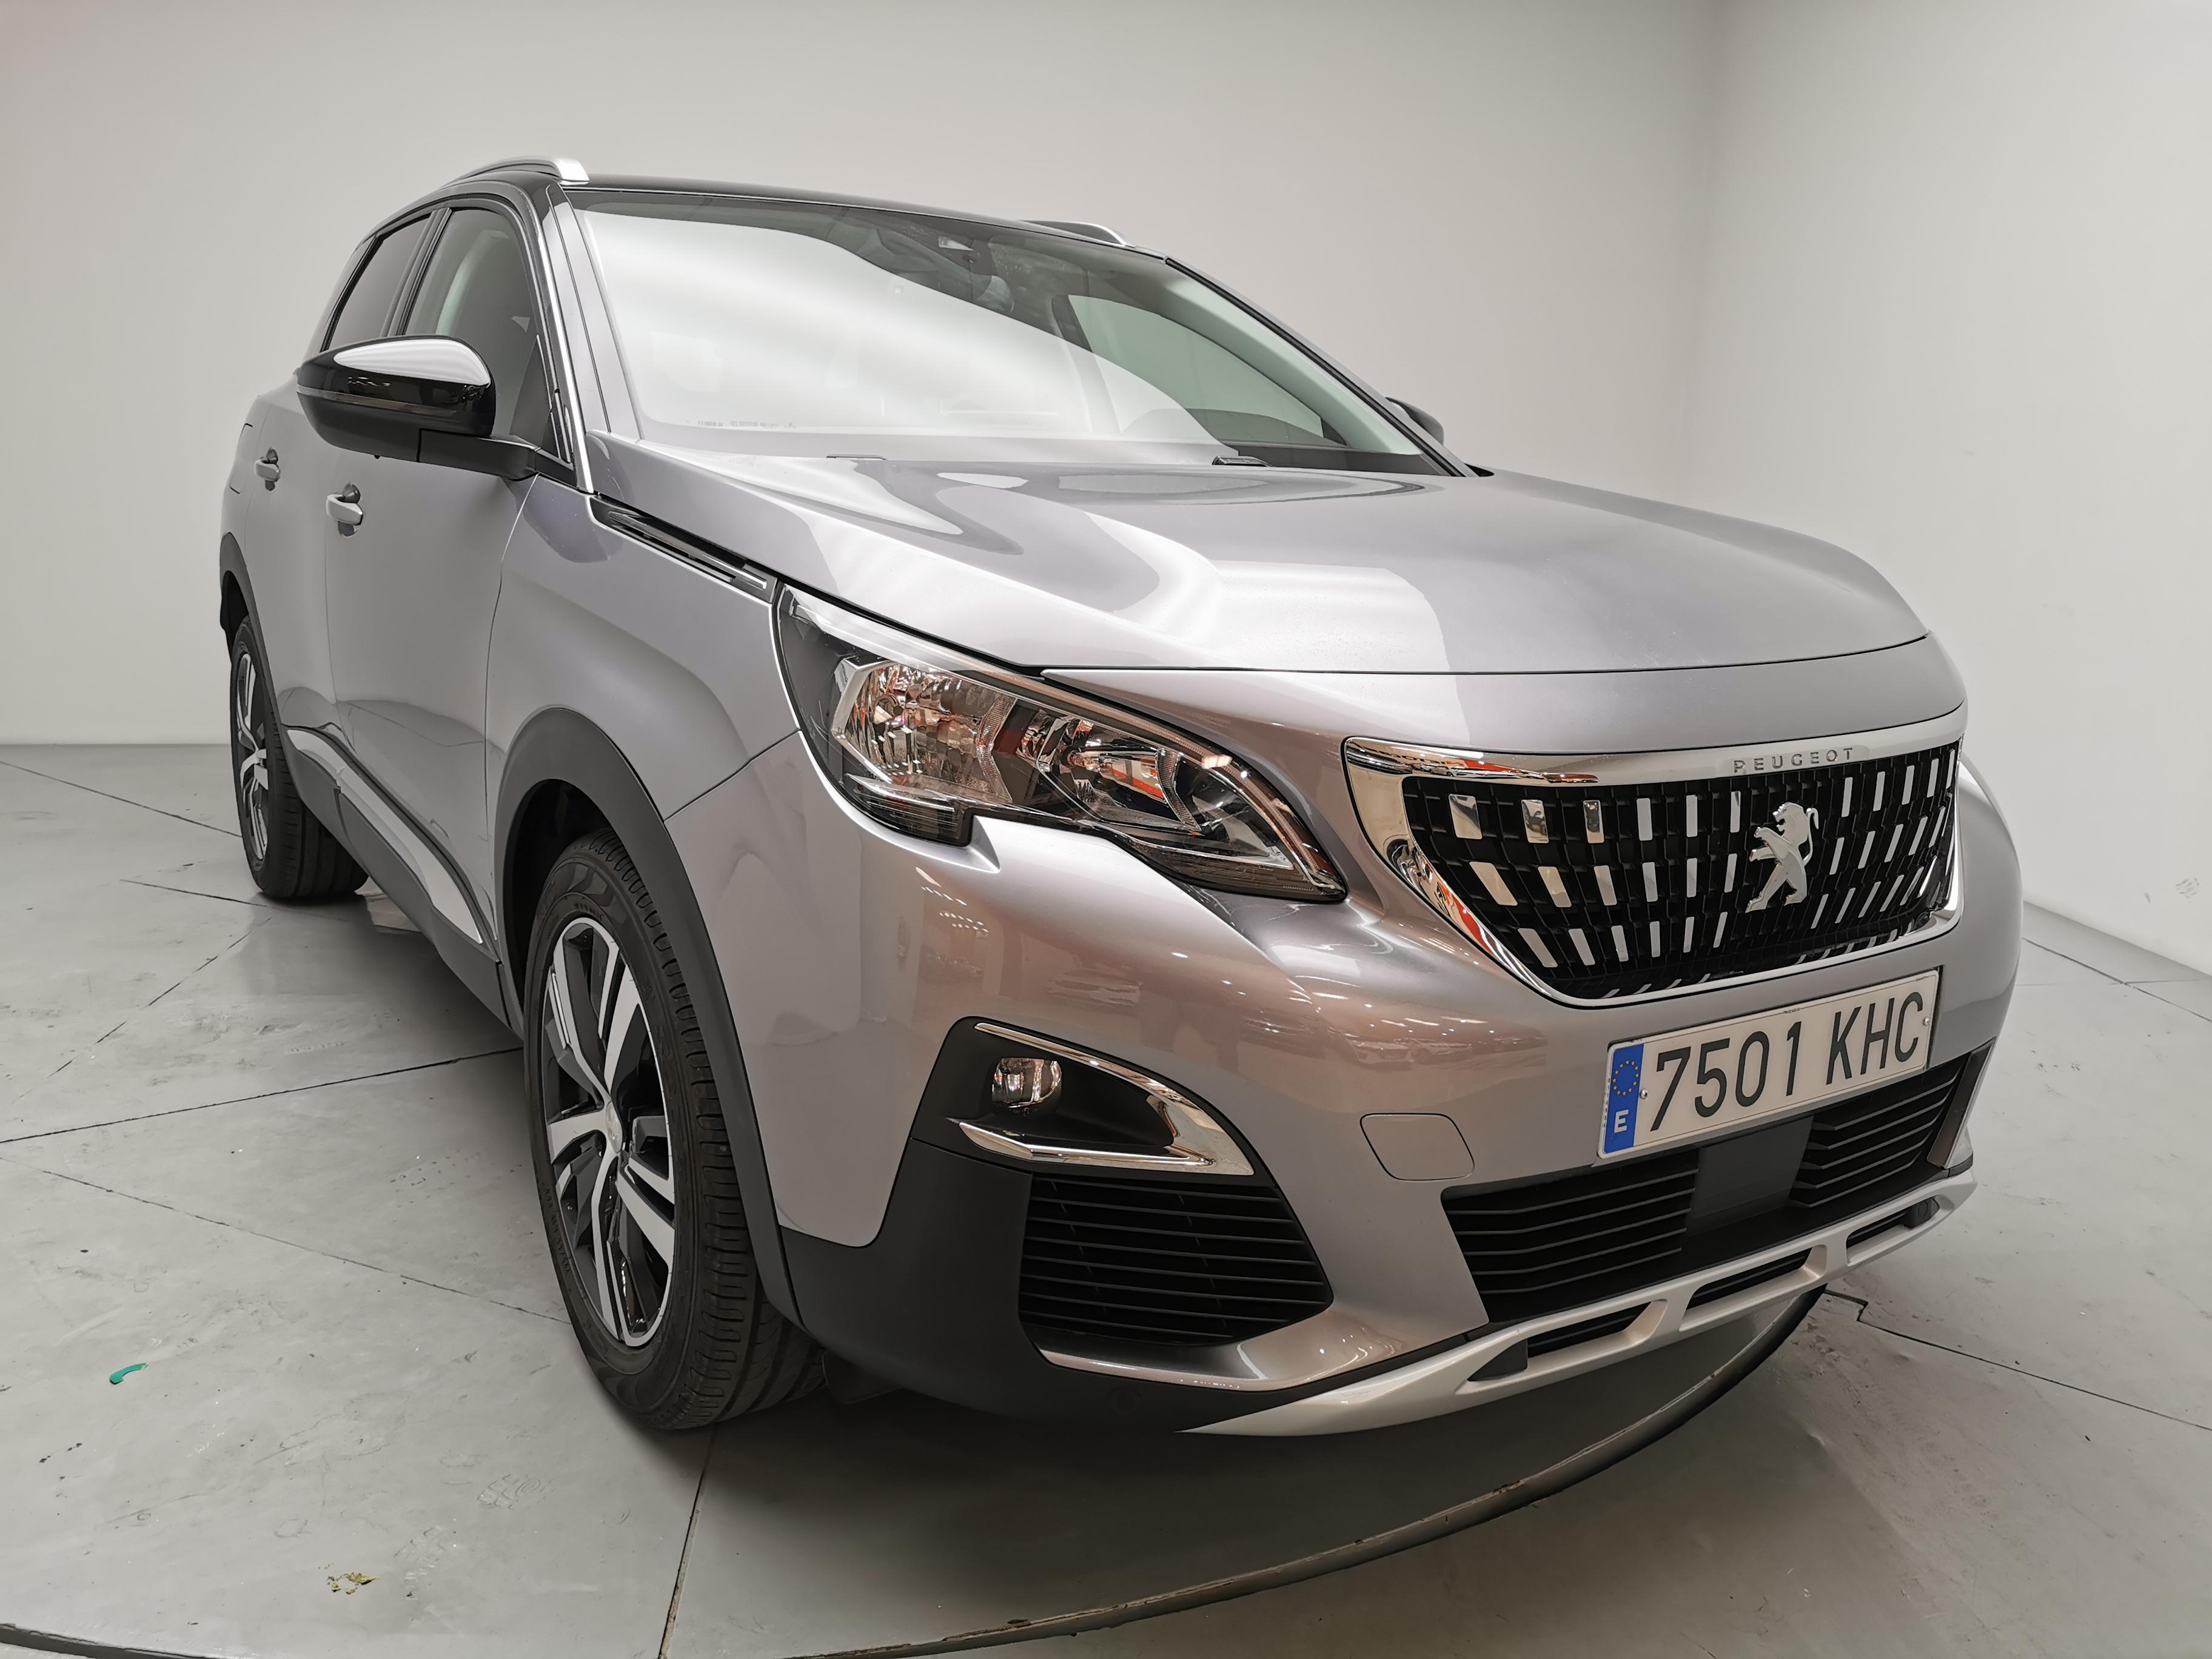 Peugeot 3008 ocasión segunda mano 2018 Diésel por 22.500€ en Málaga